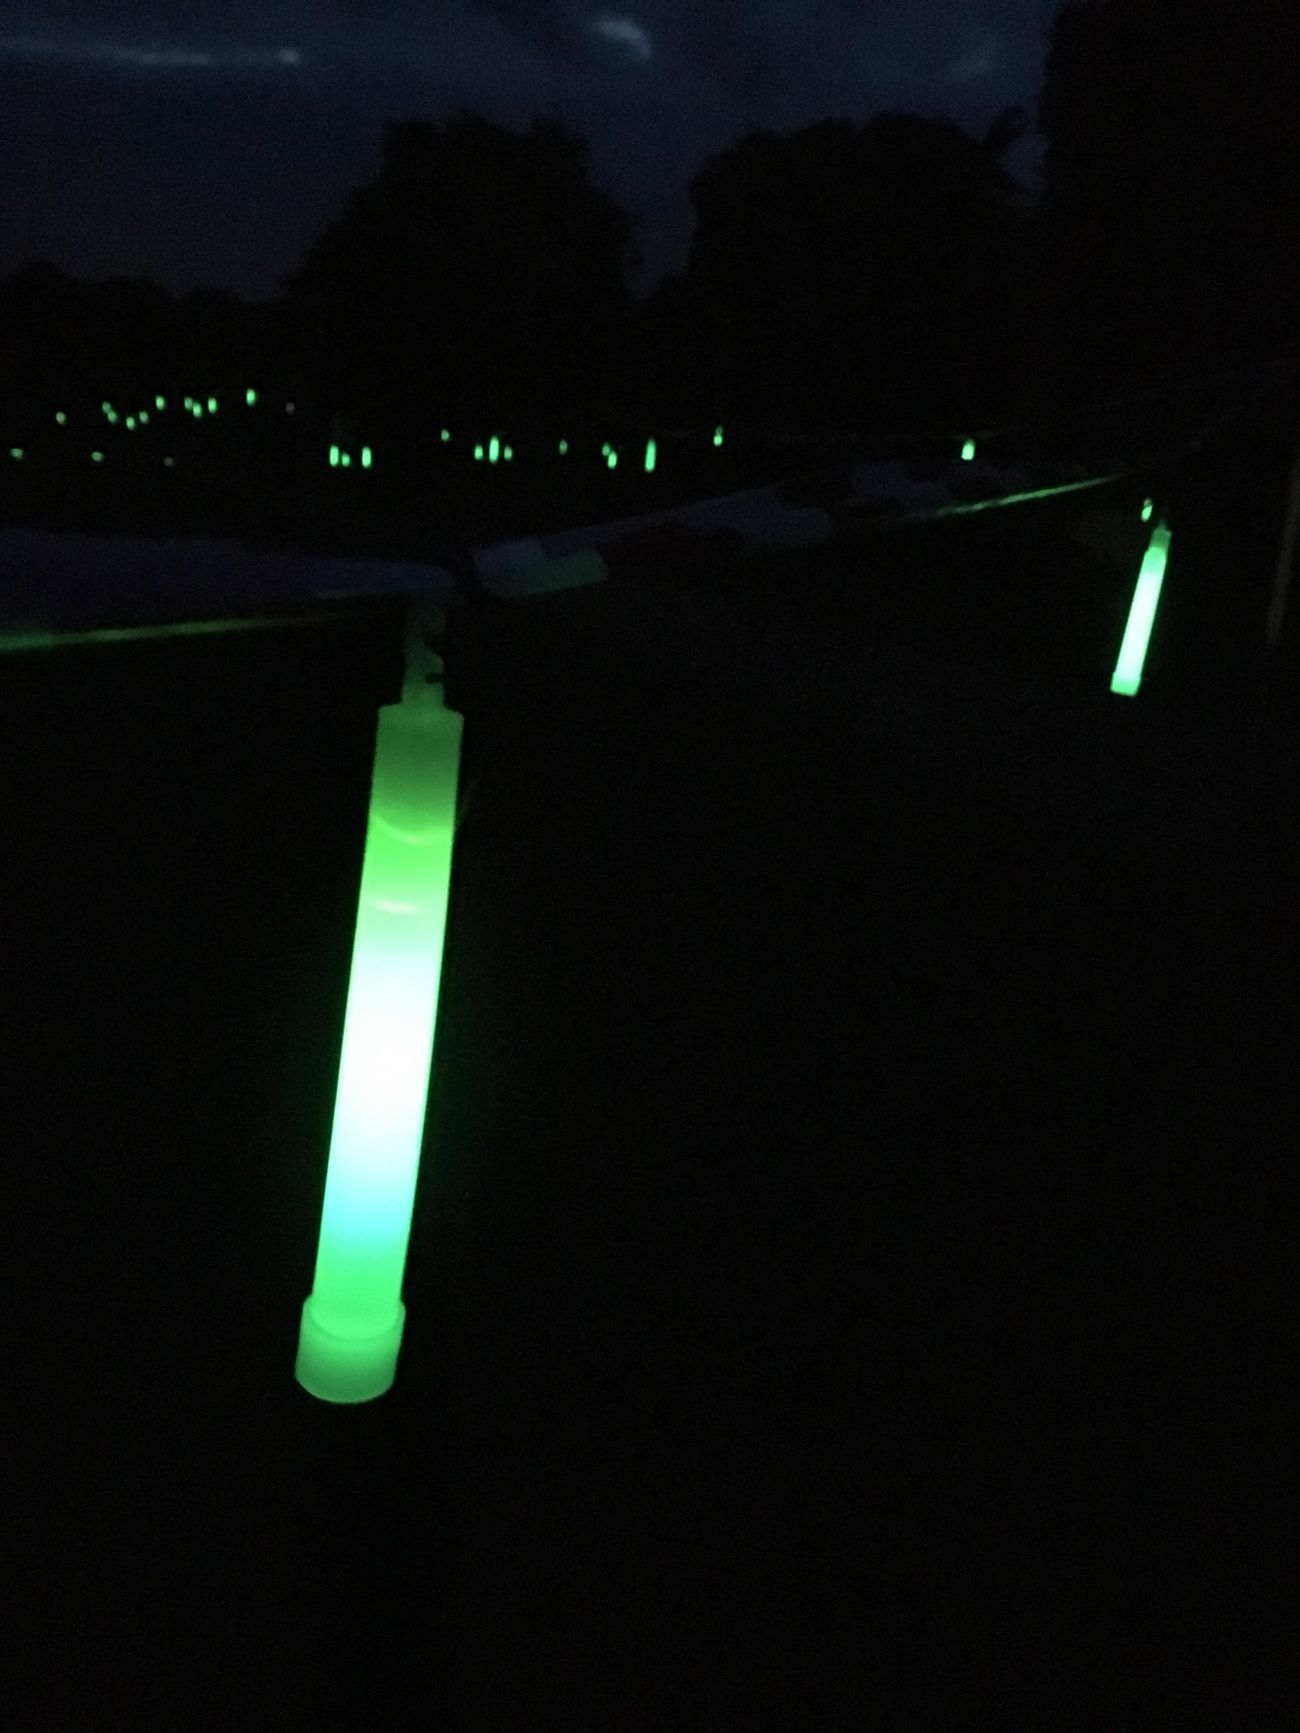 Illuminated Dark Night Electric Light Lit Darkness No People Green Color Glowsticks Glow EyeEm EyeEm Gallery Eye4photography  Eyeemphotography Eyeem Photography Artificial Light